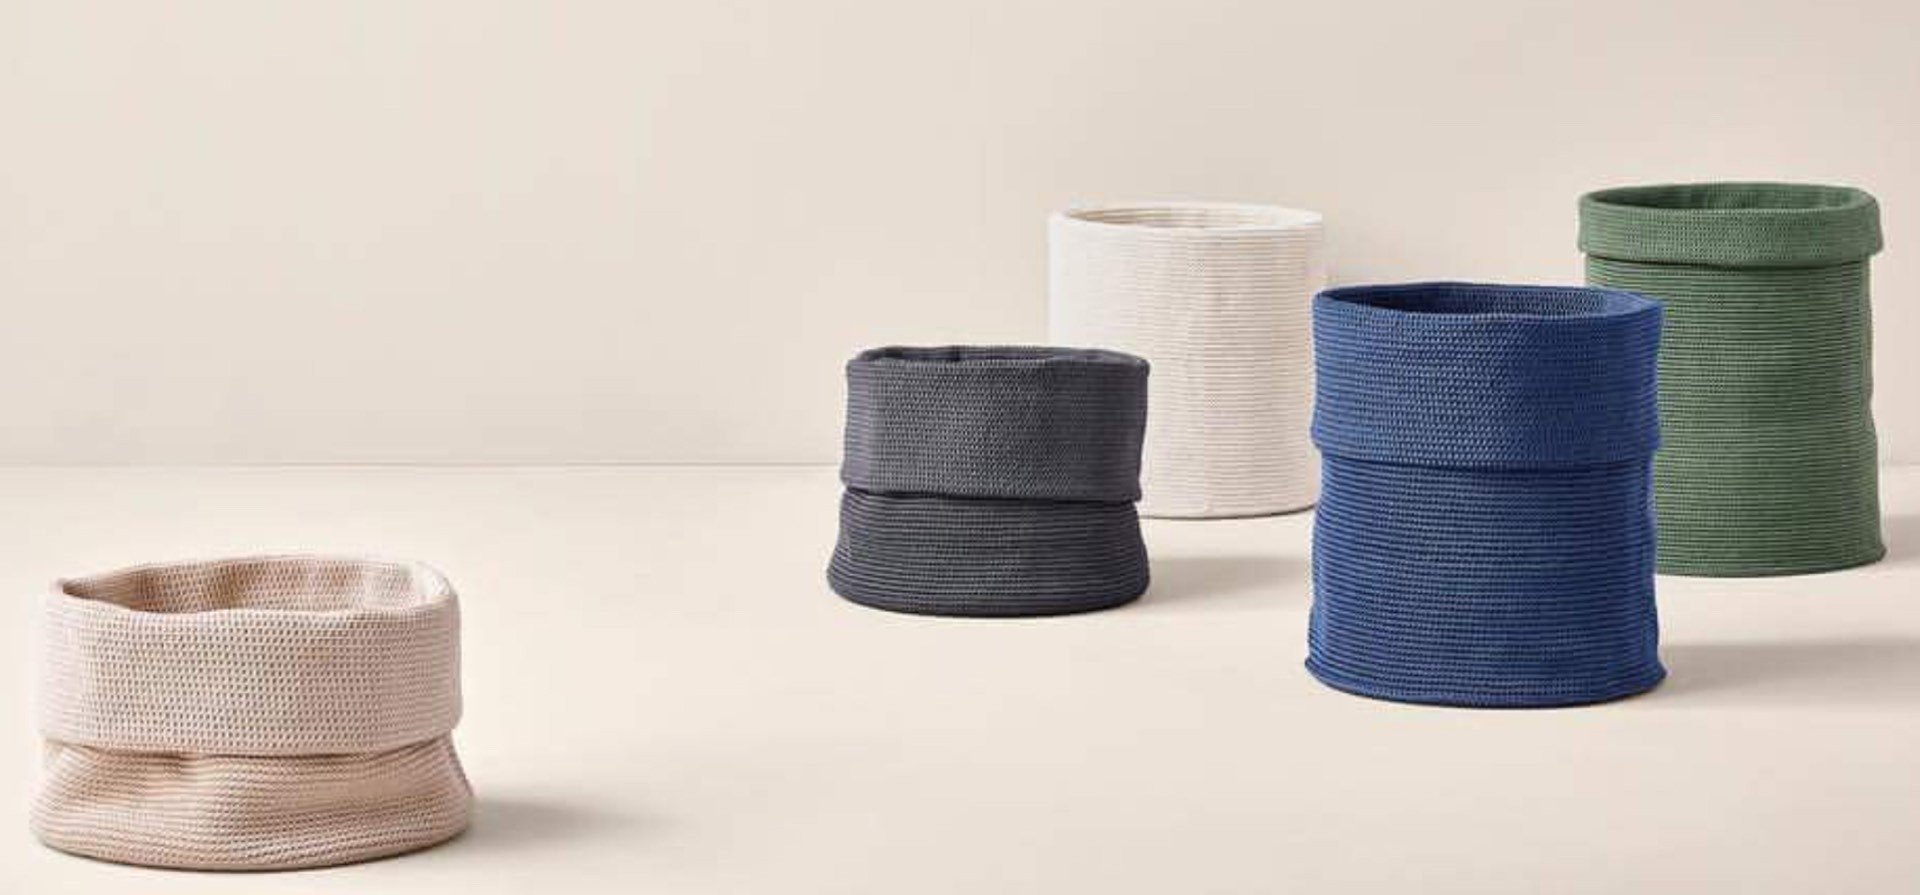 kvell-rollo-laundry-hamper-2